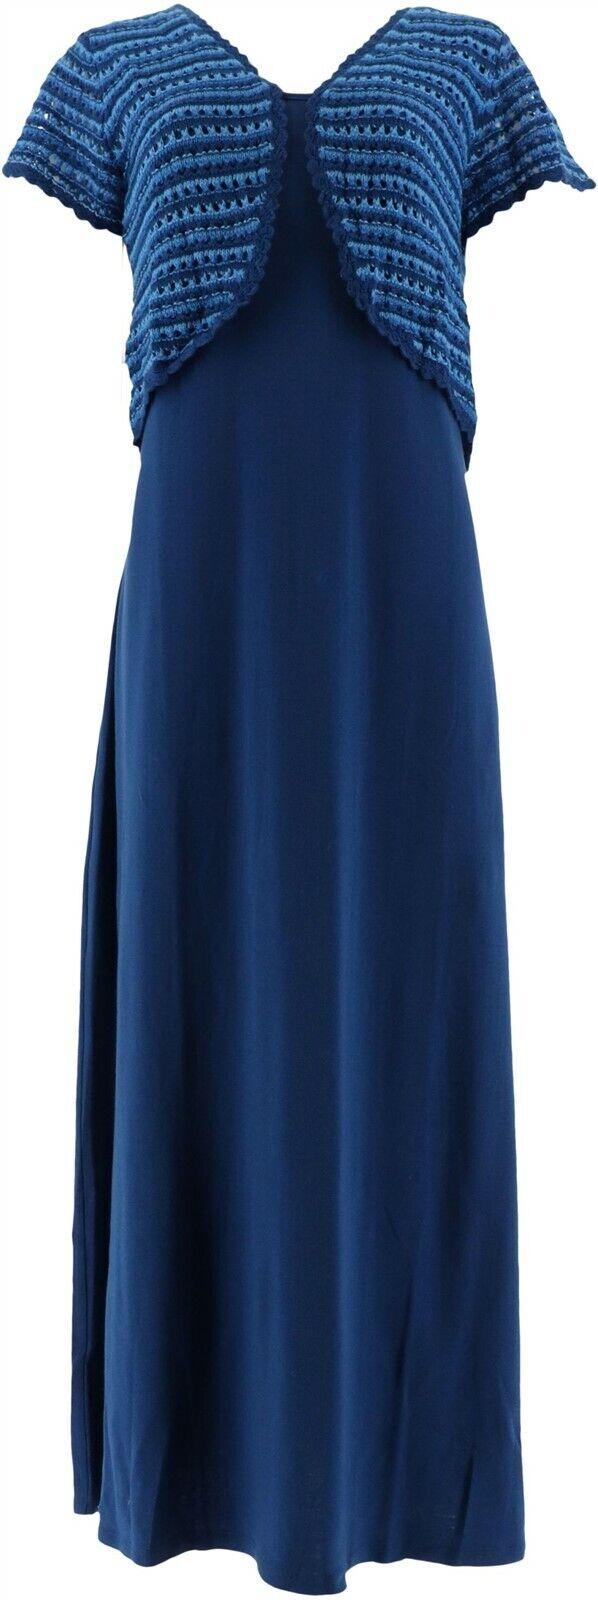 Attitudes Renee Como Jersey Slvless Mock Neck Dress Tangerine M NEW A301367